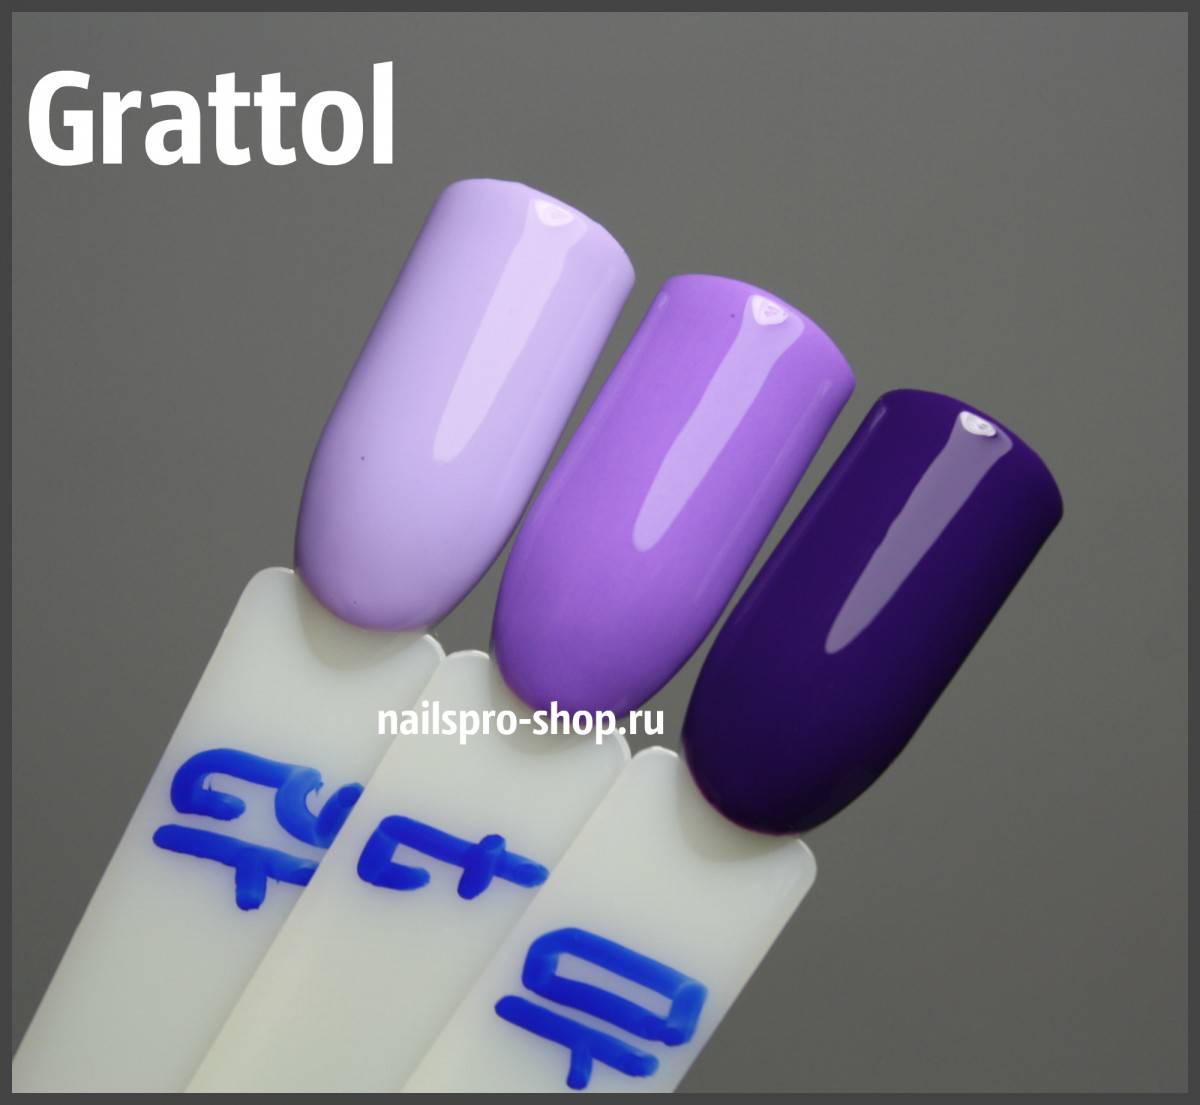 Grattol Color Gel Polish 010 Eggplant